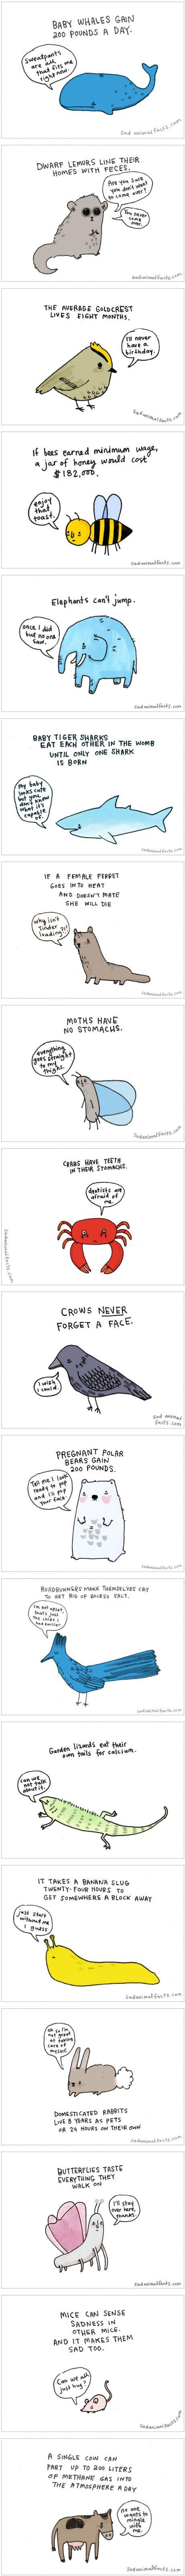 Sad Animal Facts (by Brooke Barker)                                                                                                                                                                                 More